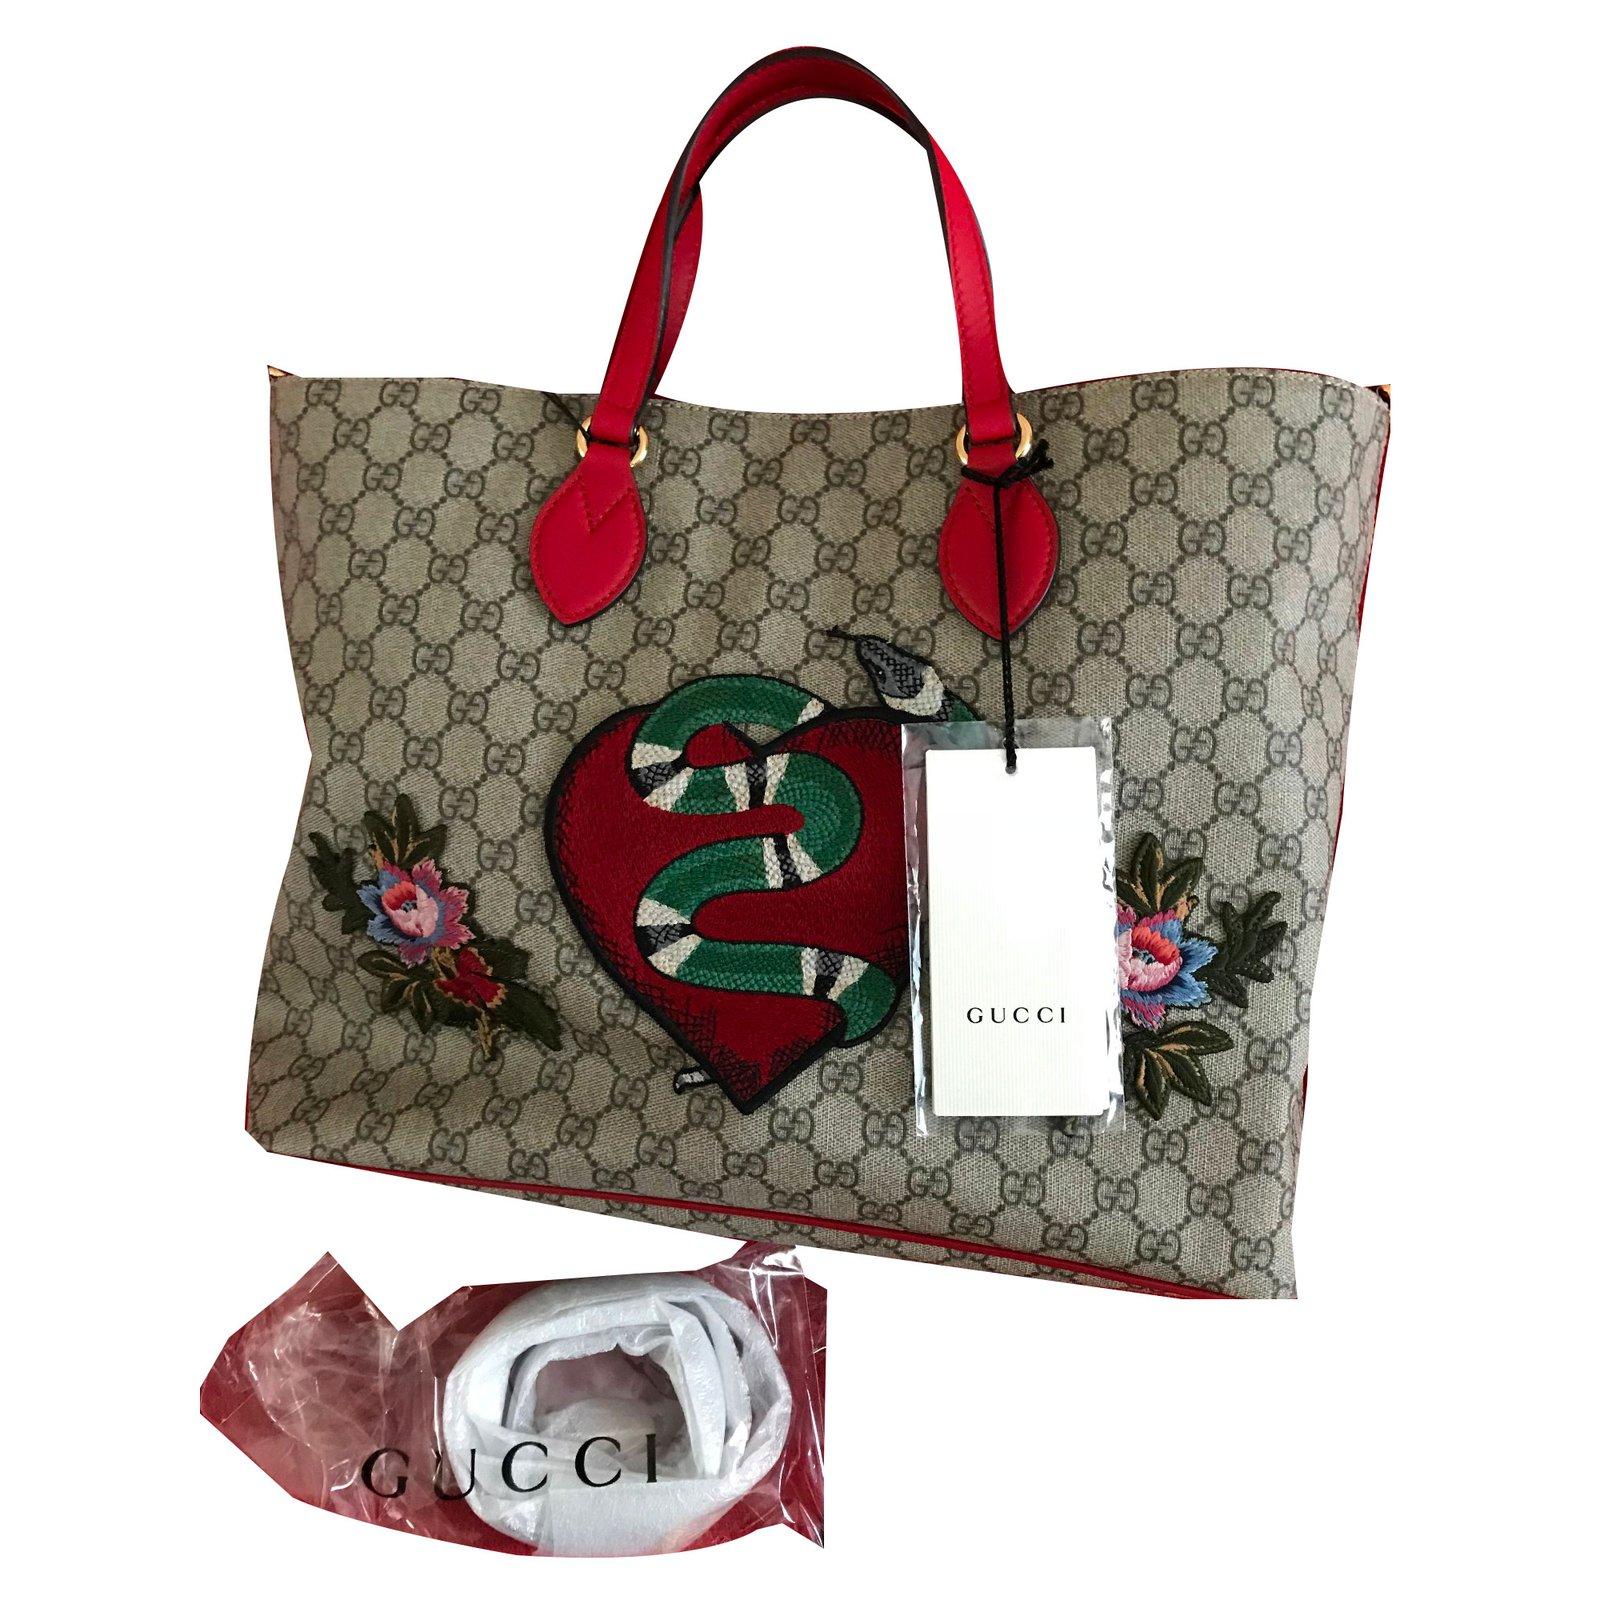 cc34039ba49aa1 Gucci Gucci Limited Edition Soft GG Supreme Tote Bag - Brand New with tags!  Handbags Cloth Beige ref.58453 - Joli Closet